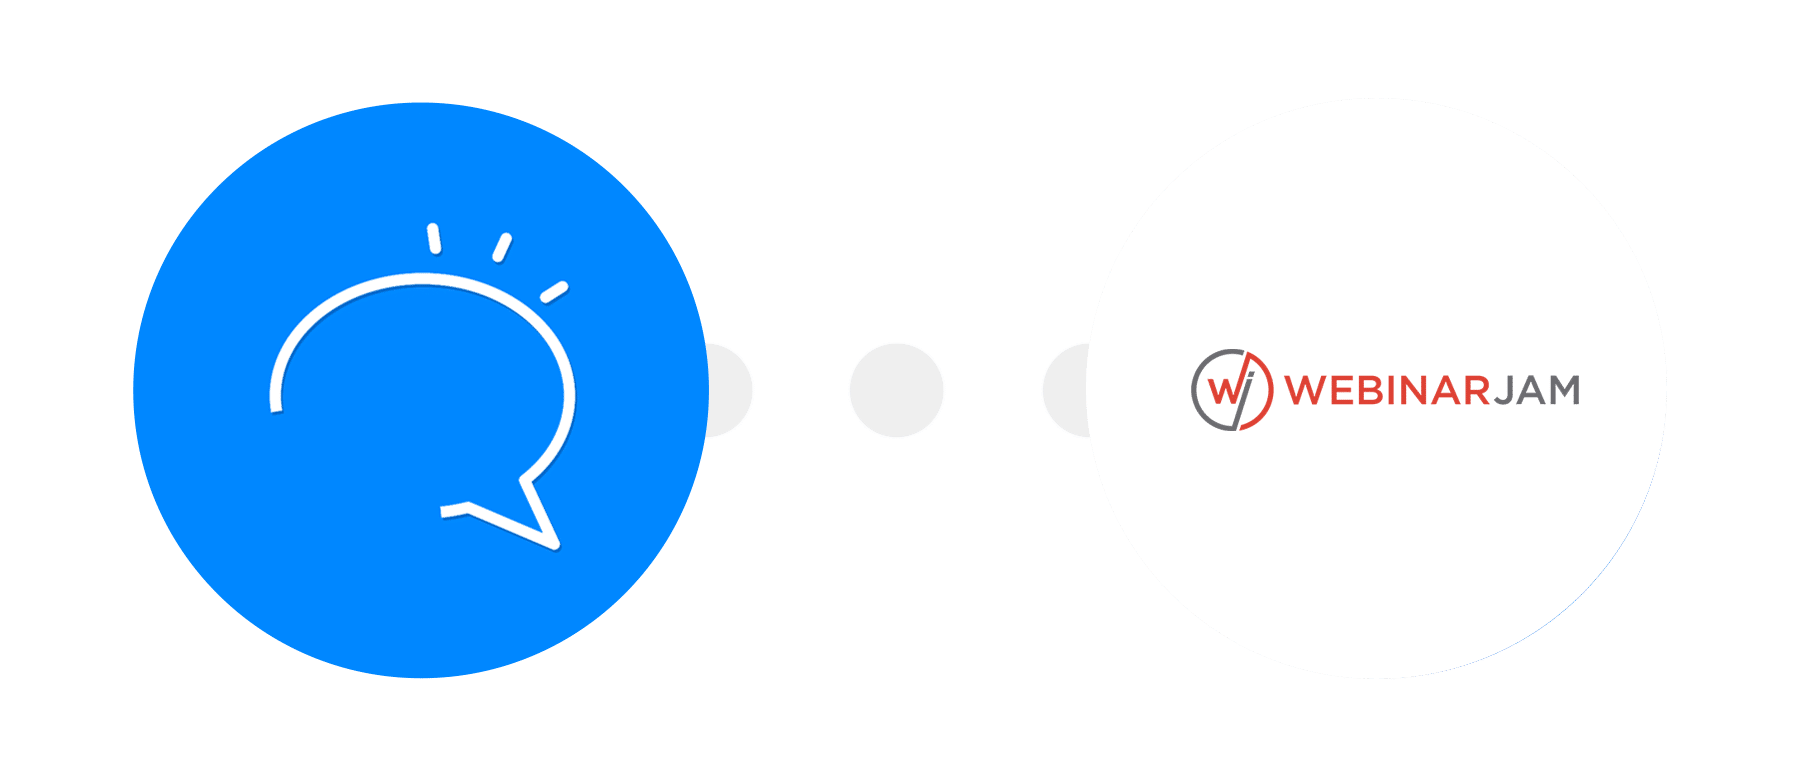 WebinarJam integrates with Clever Messenger